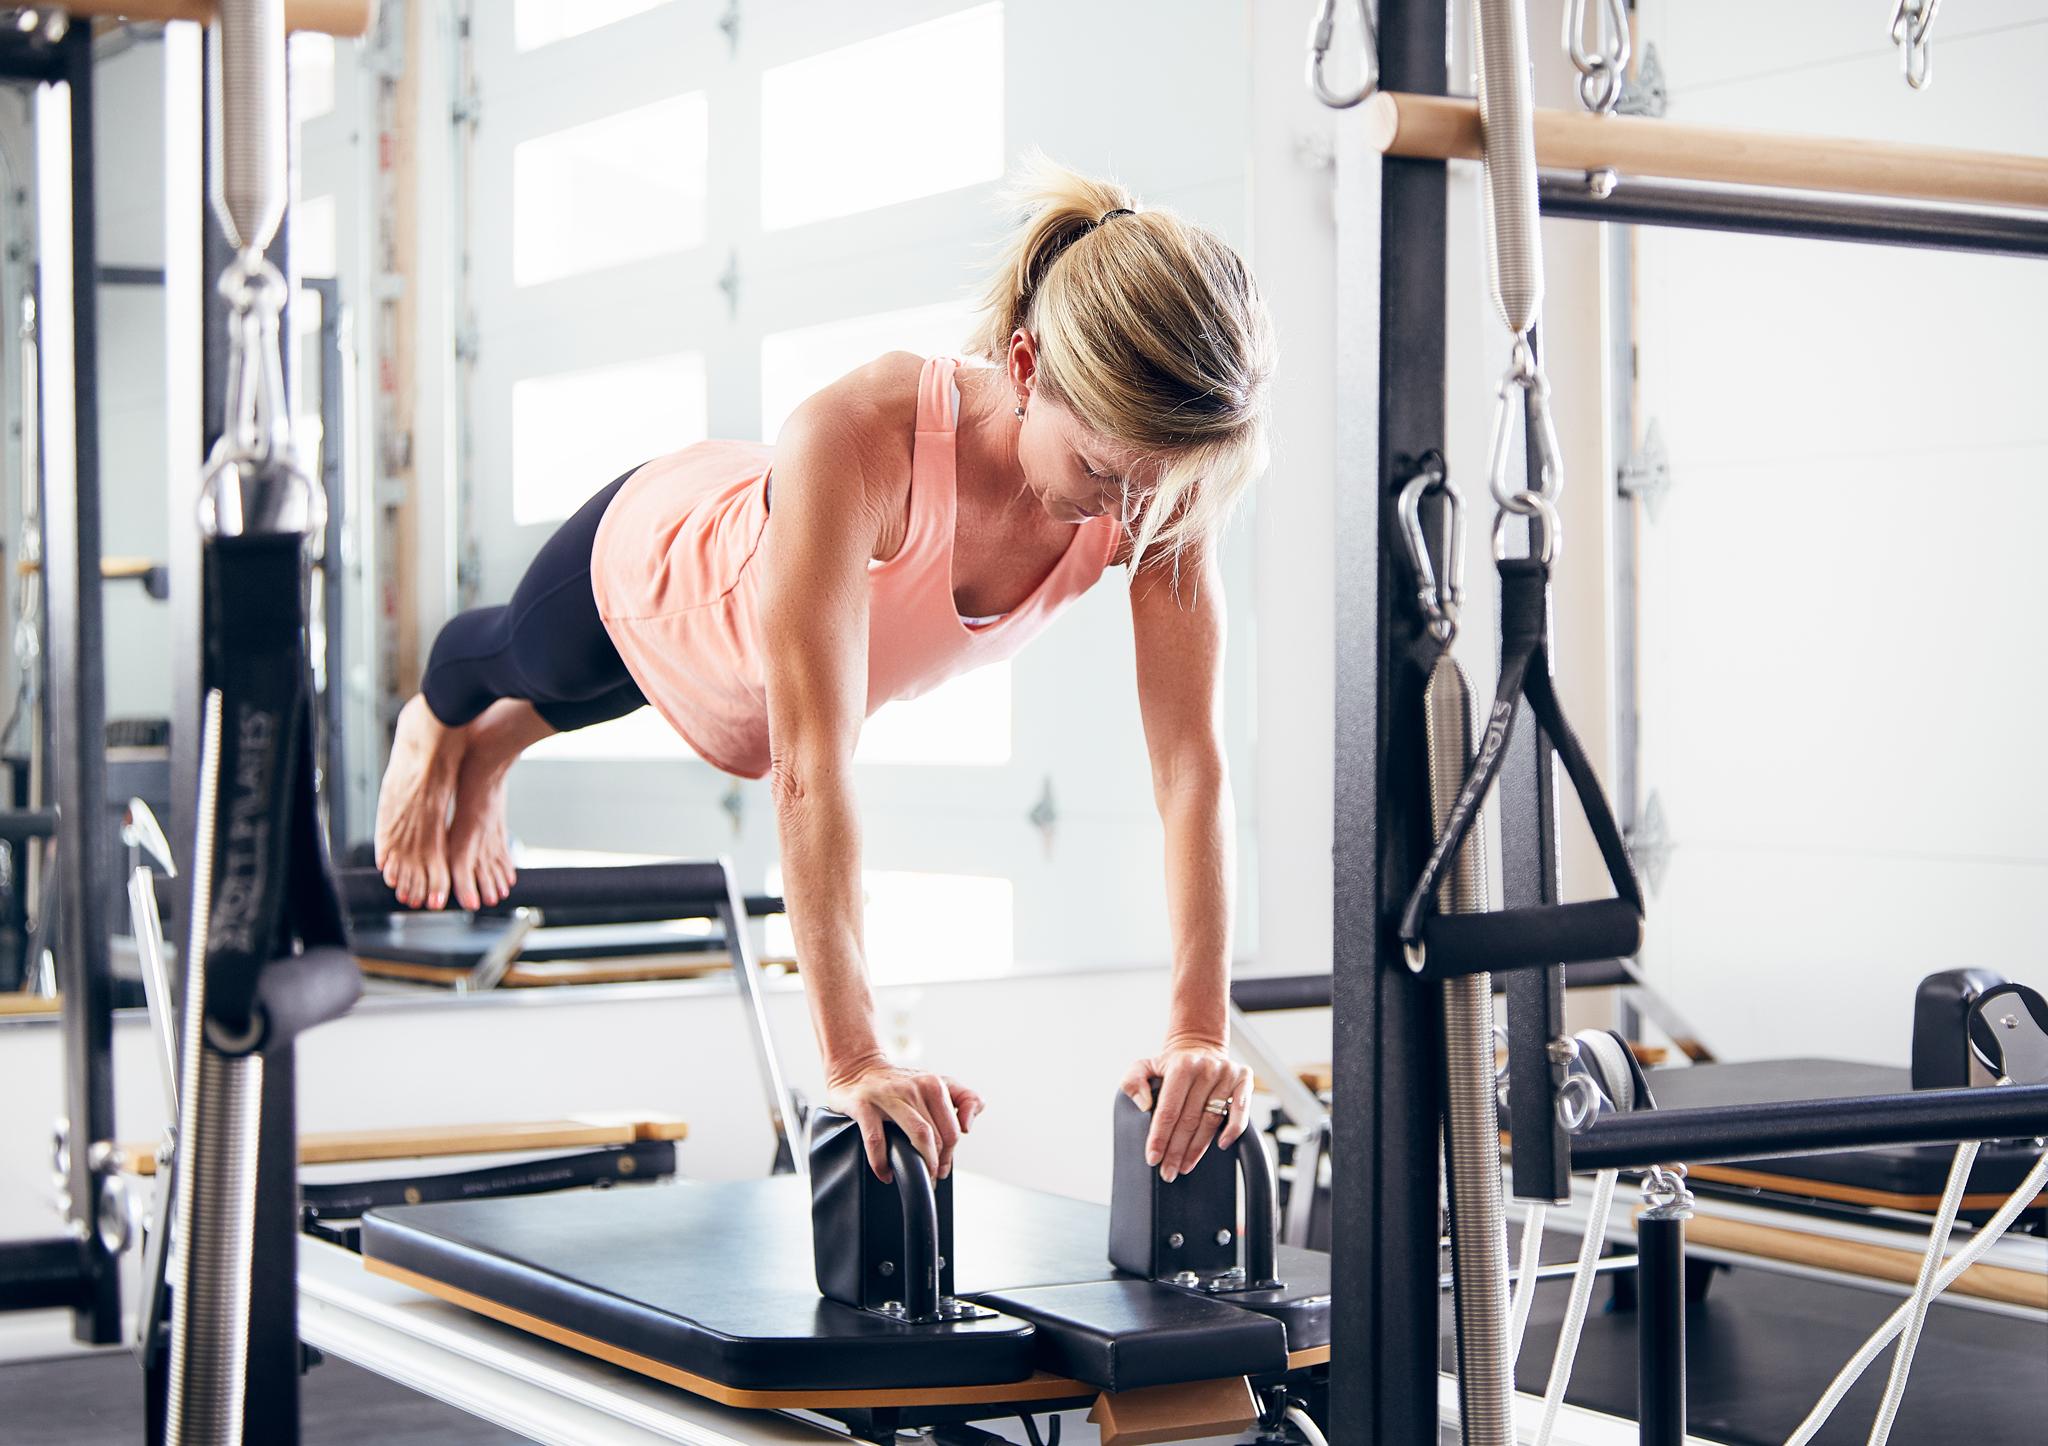 Phoenix Commercial Fitness Photographer - Pilates Instructor